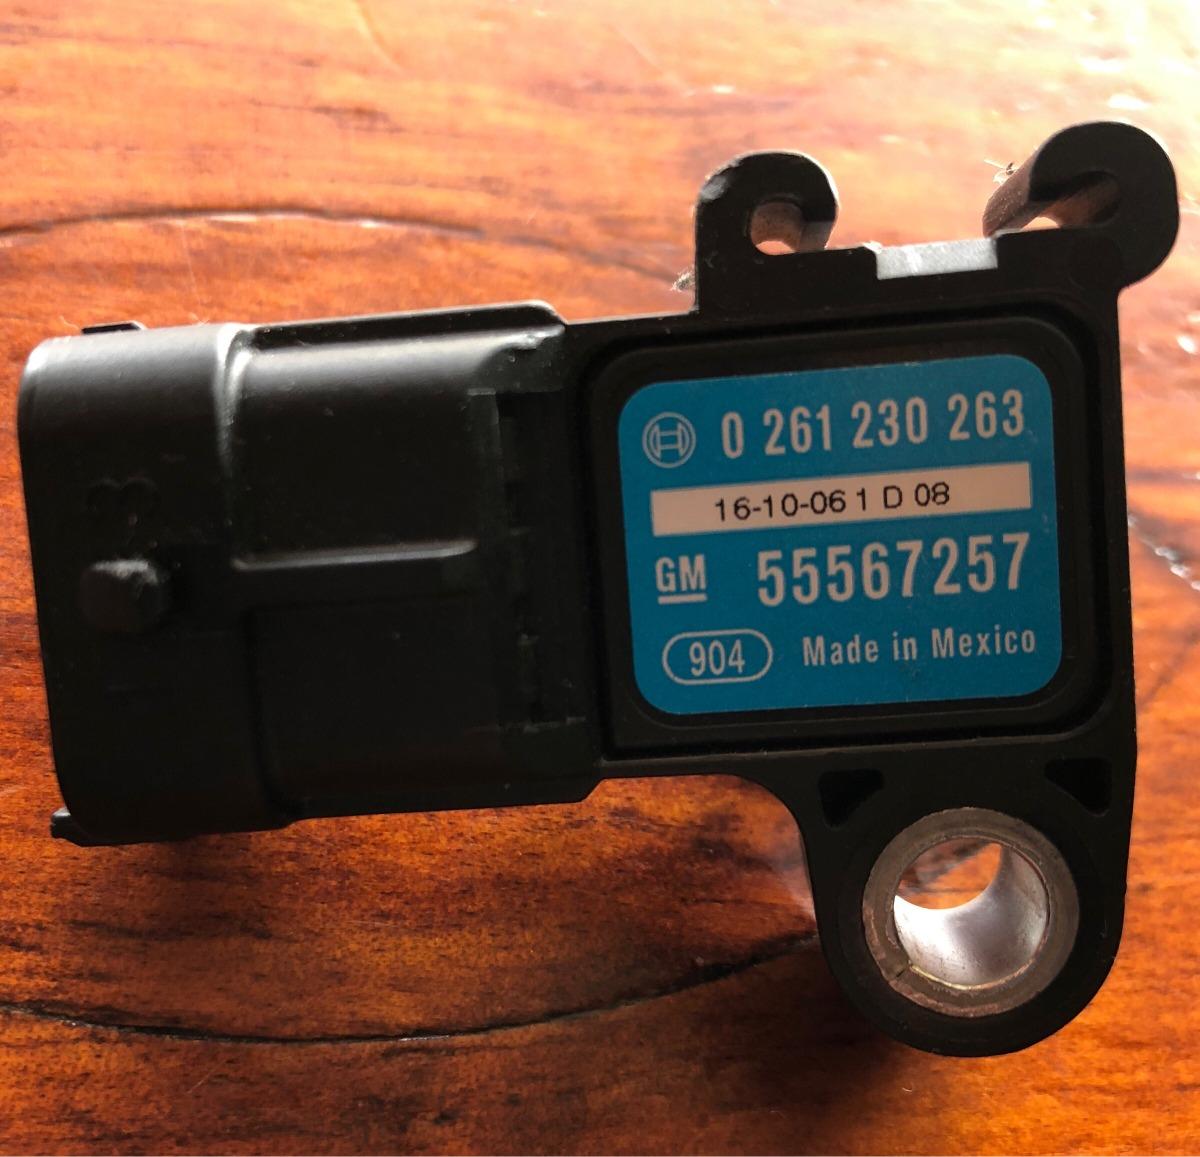 Map Sensor Location On 2011 Chevy Cruze: Sensor Map 0261 230 263 Chevrolet Sonic, Cruze 2011-2014